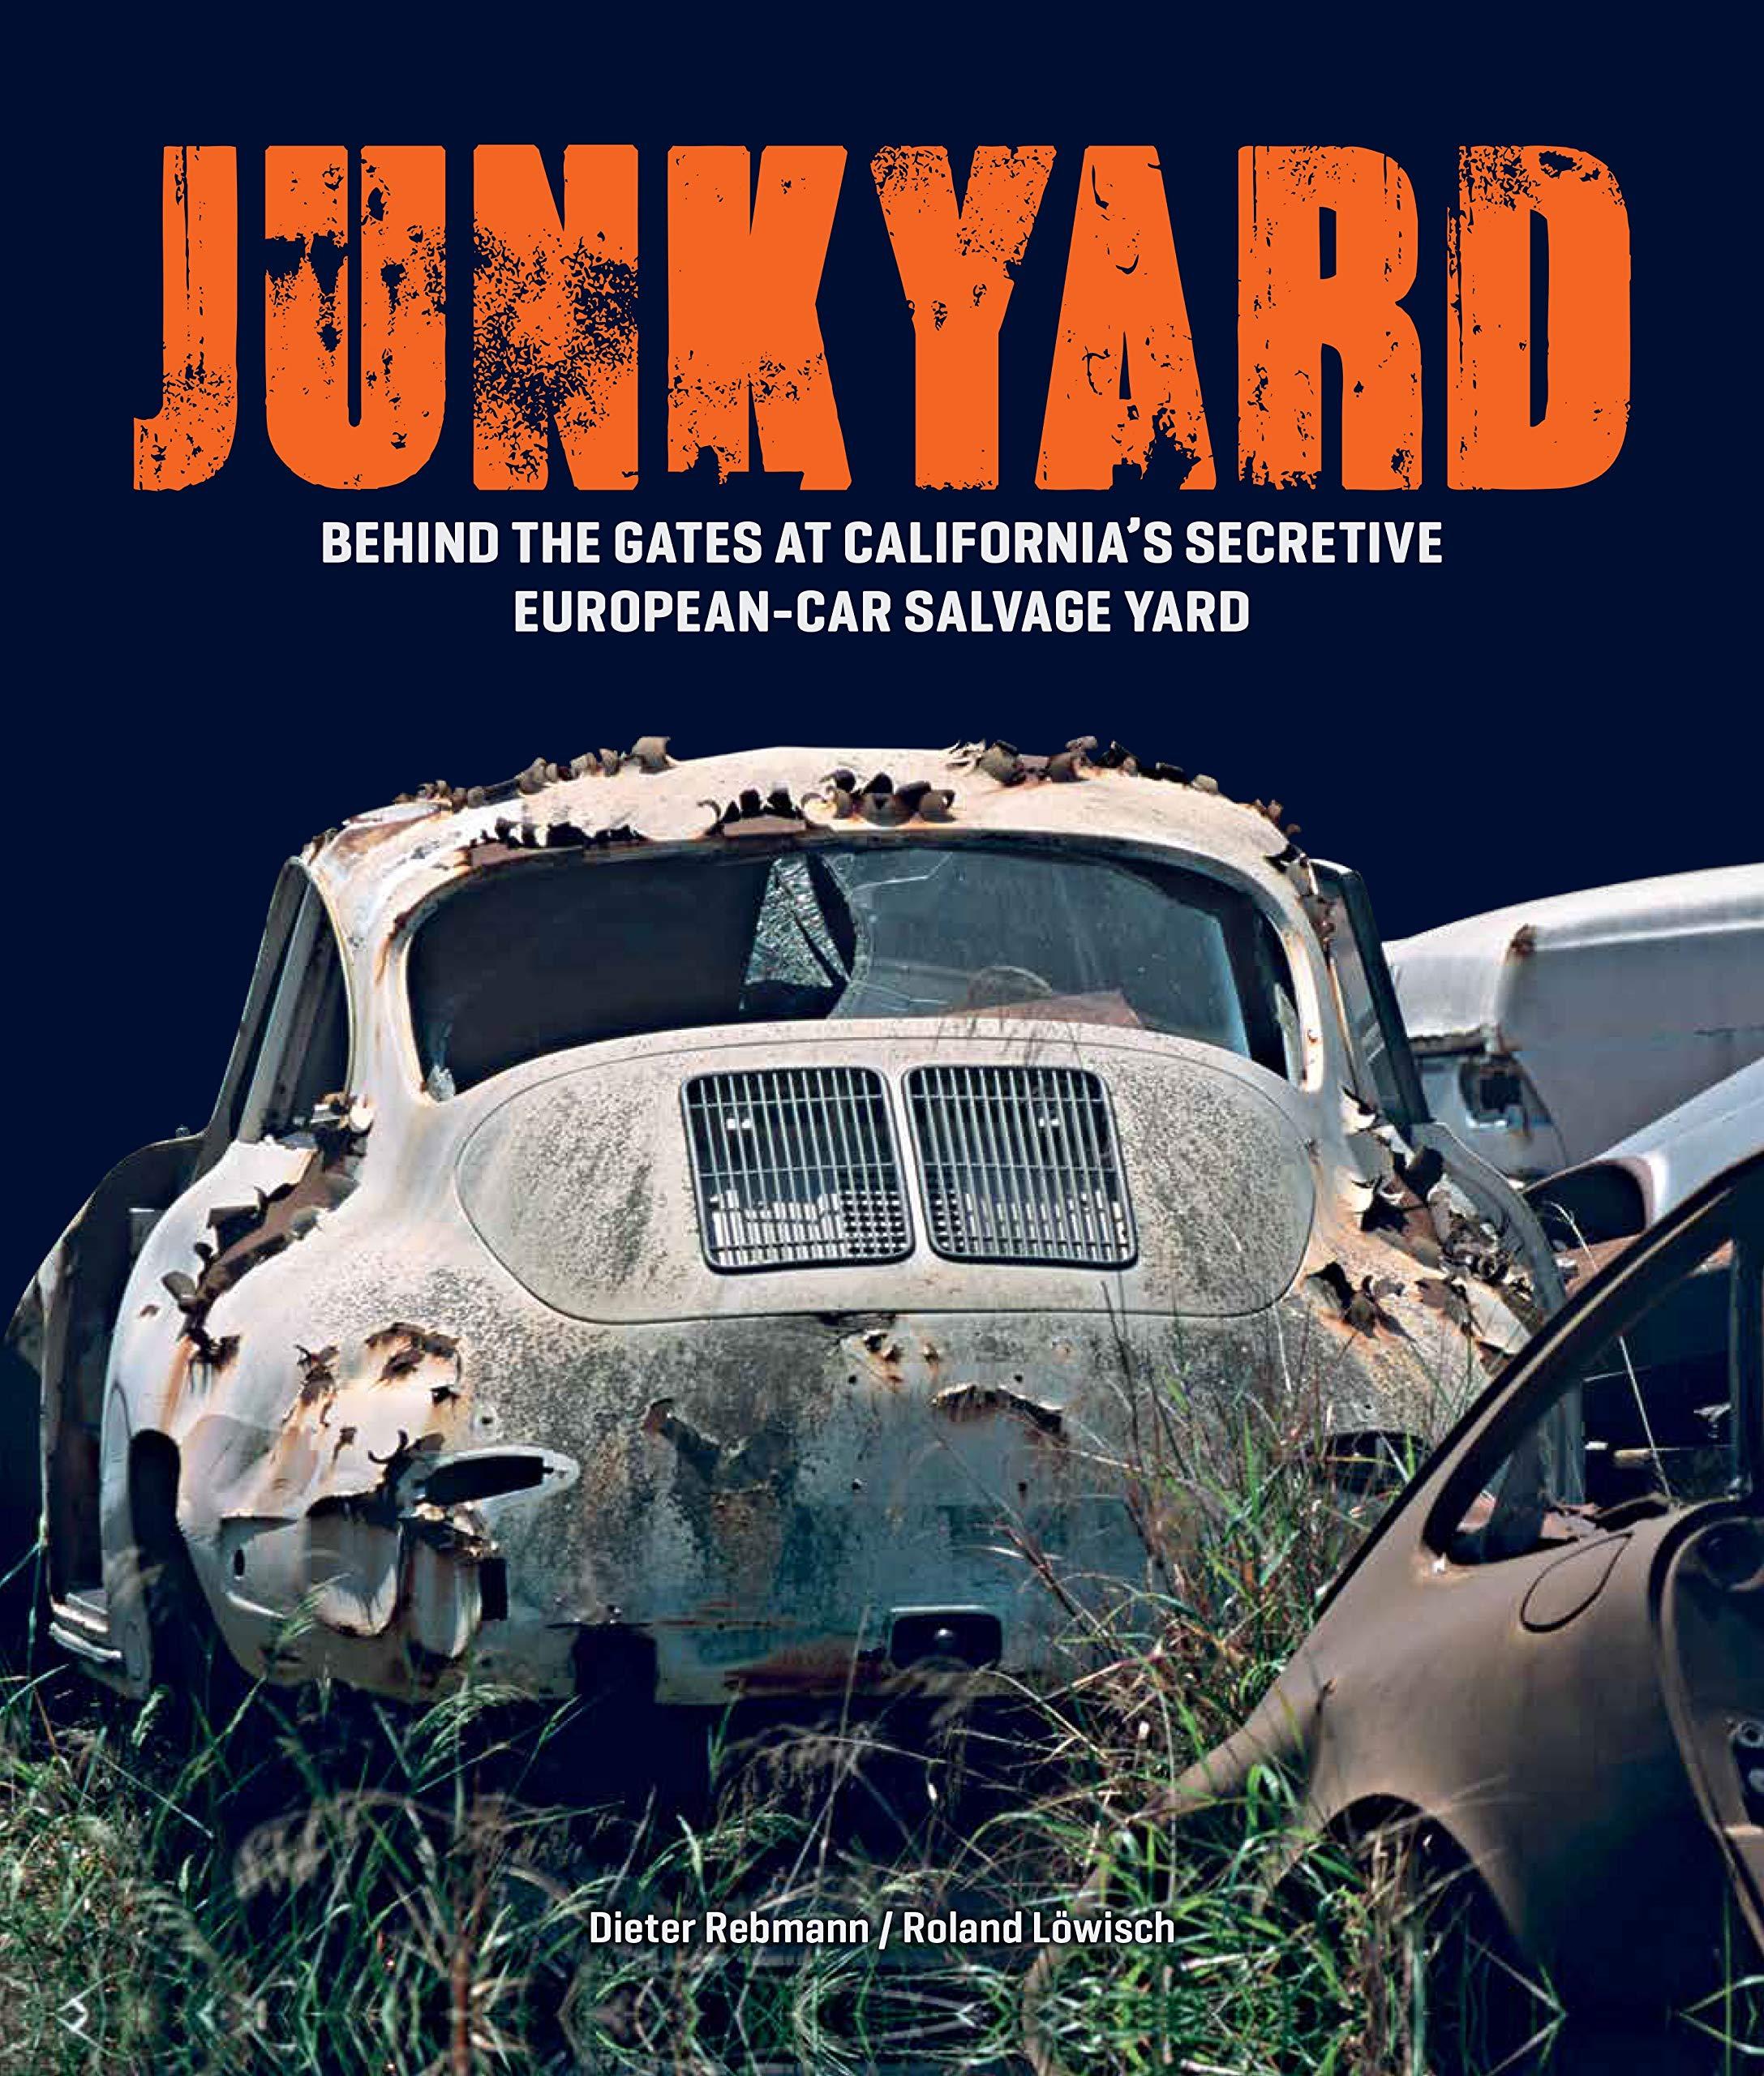 Junkyard: Behind the Gates at California's Secretive European-Car Salvage Yard